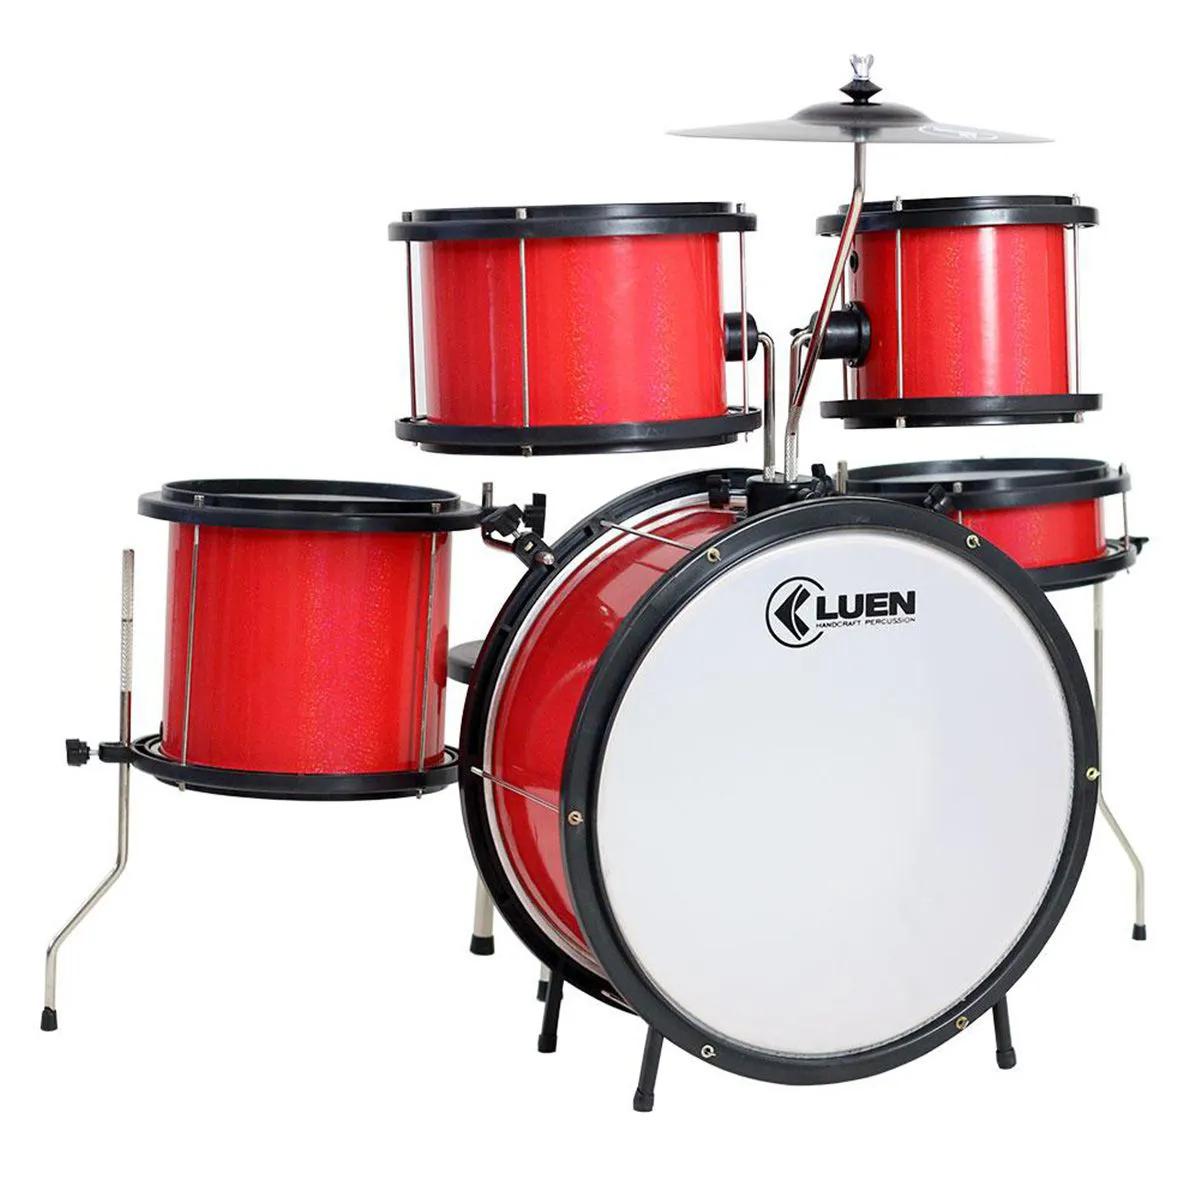 Bateria Infantil Luen Percussion Pop Bumbo 14 Vermelha